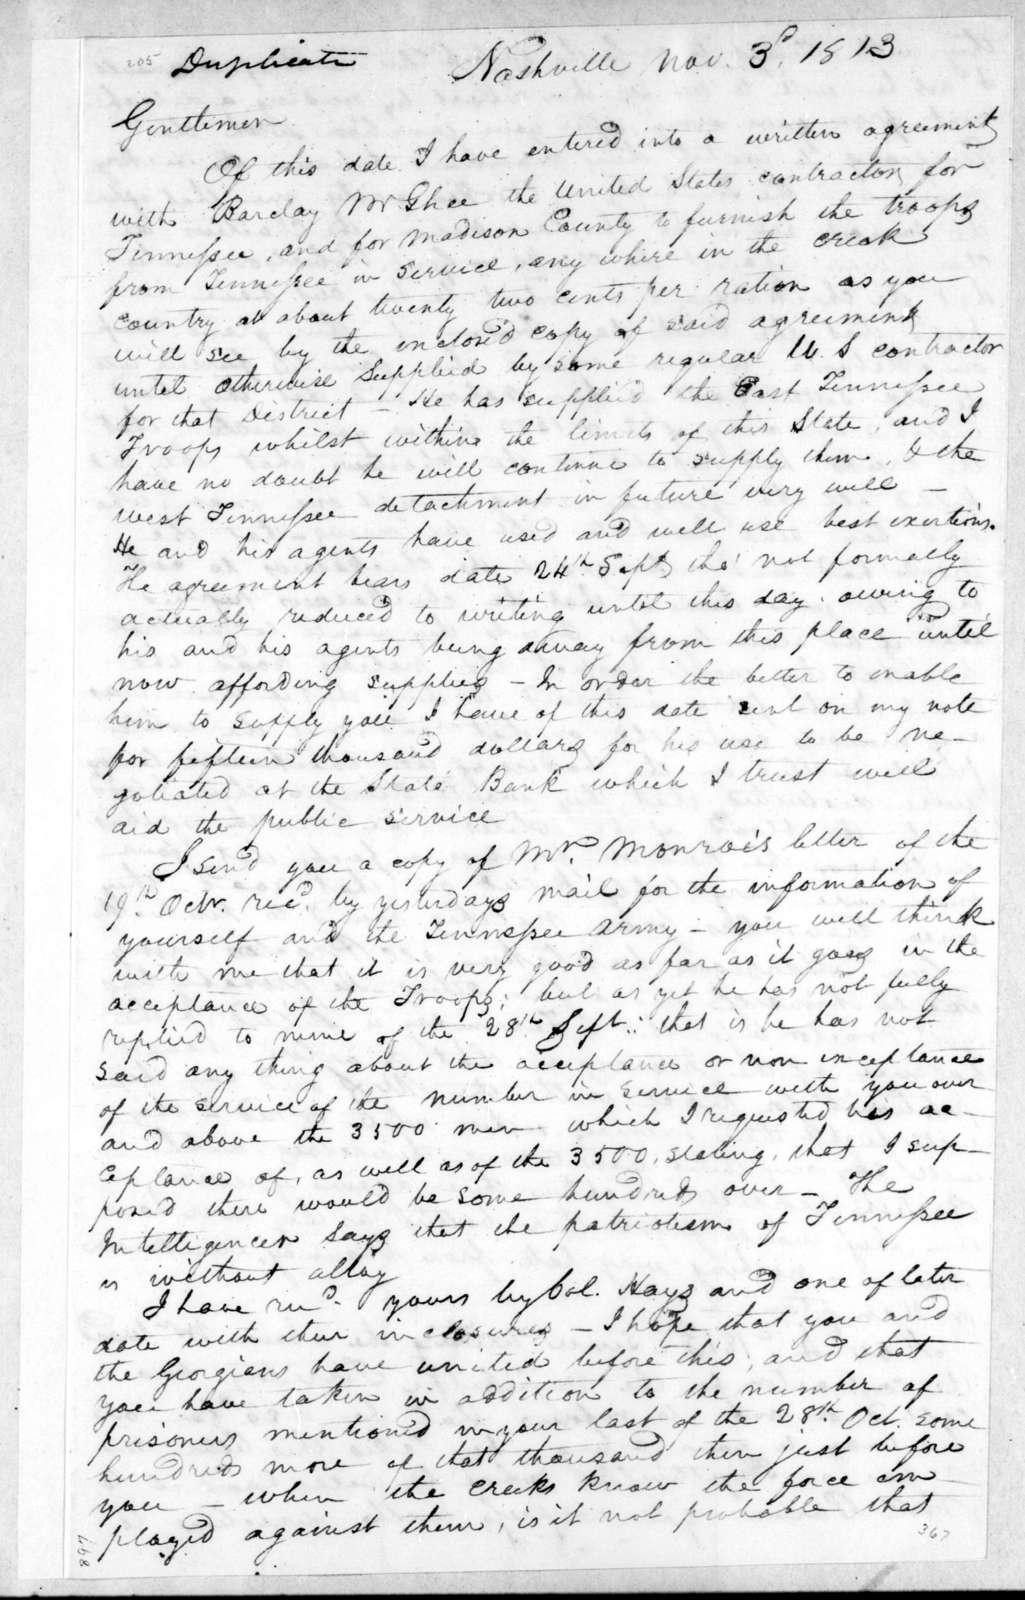 Willie Blount to Andrew Jackson, November 3, 1813